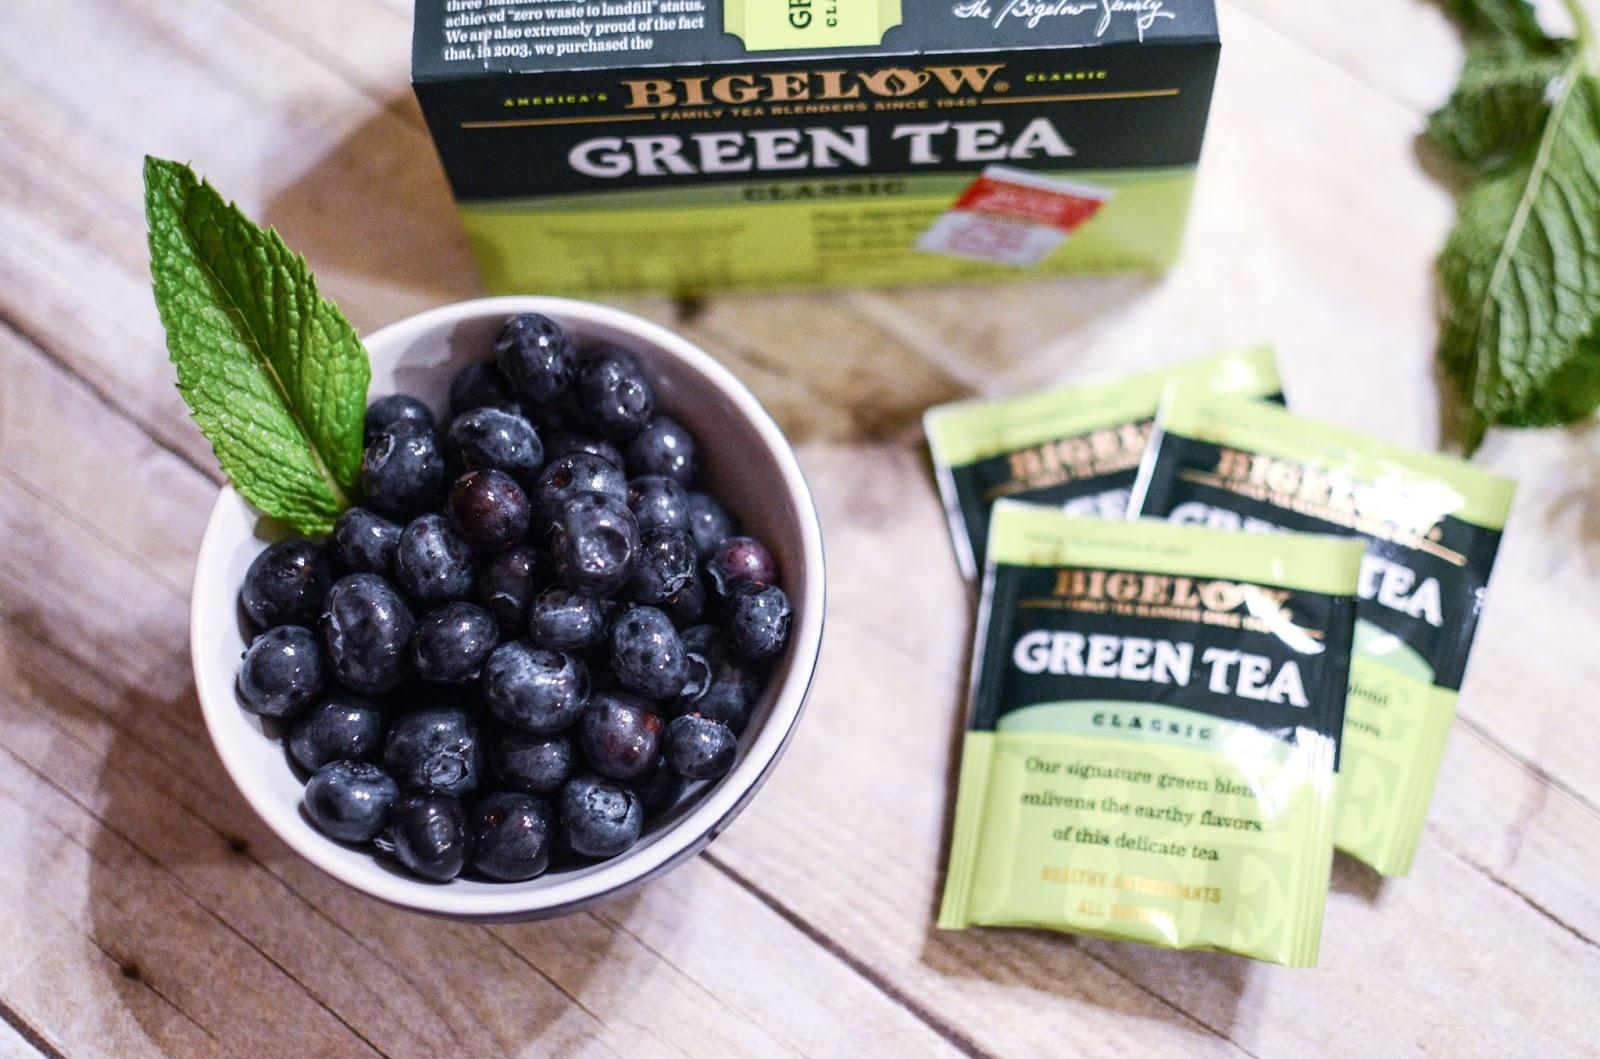 Heavens to Betsy: Blueberry Mint Iced Green Tea